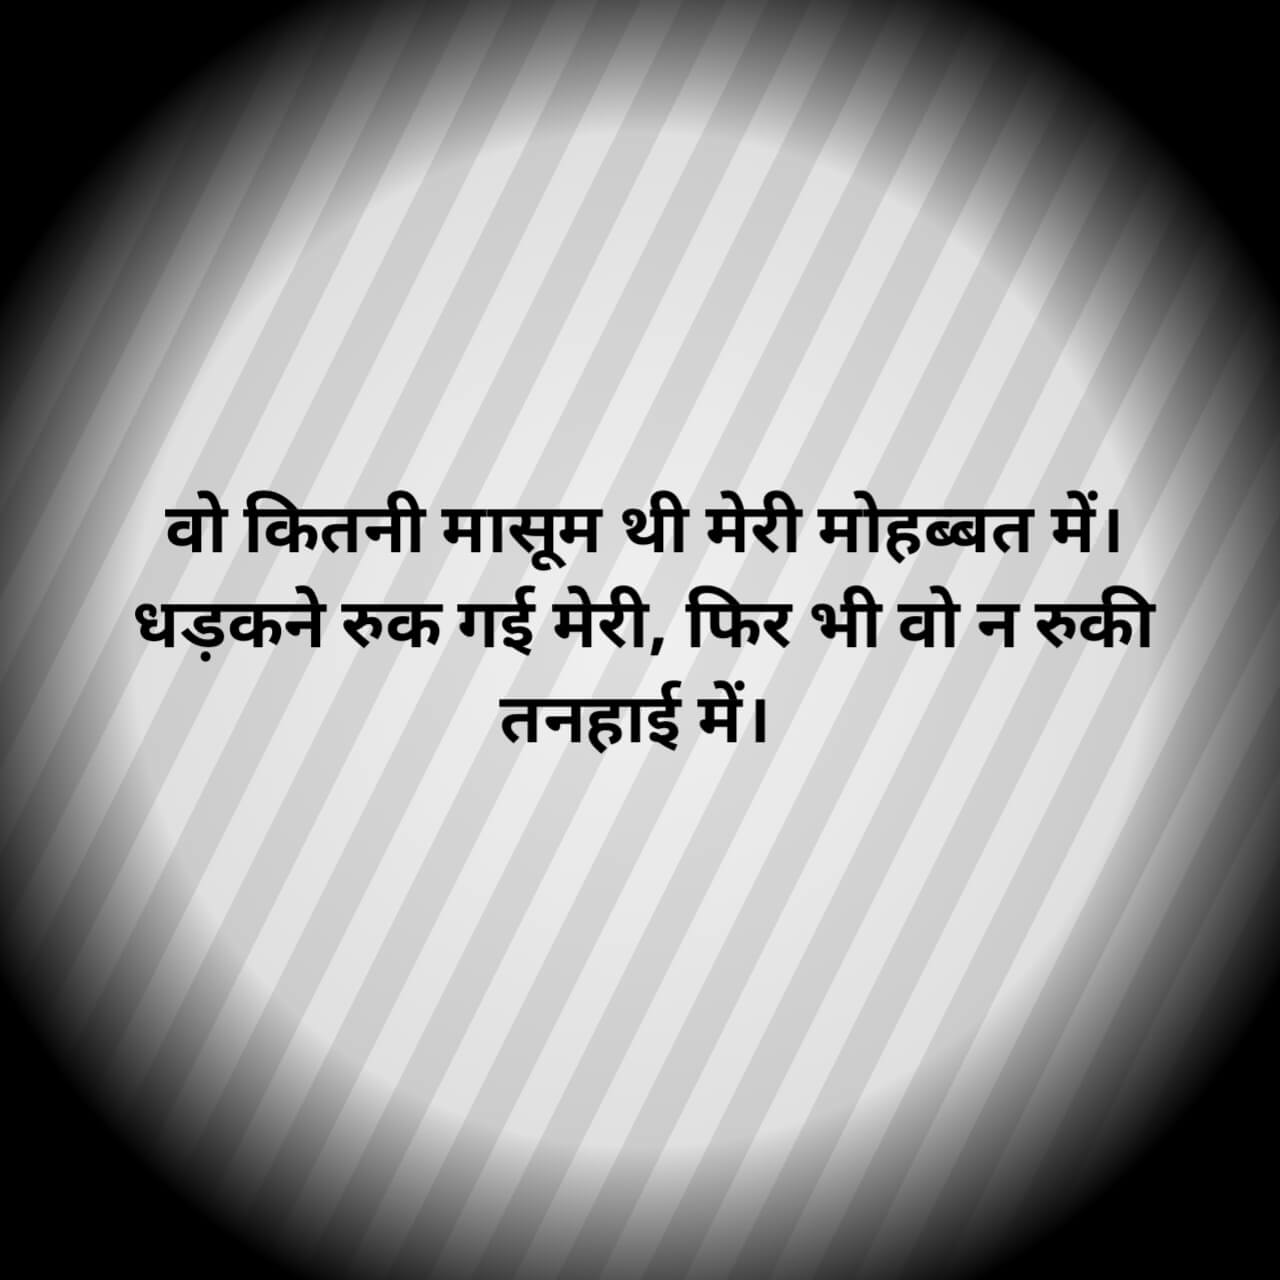 Sad love shayari | Latest शायरी in Hindi Status Image for FB, Whatsapp, Instagram